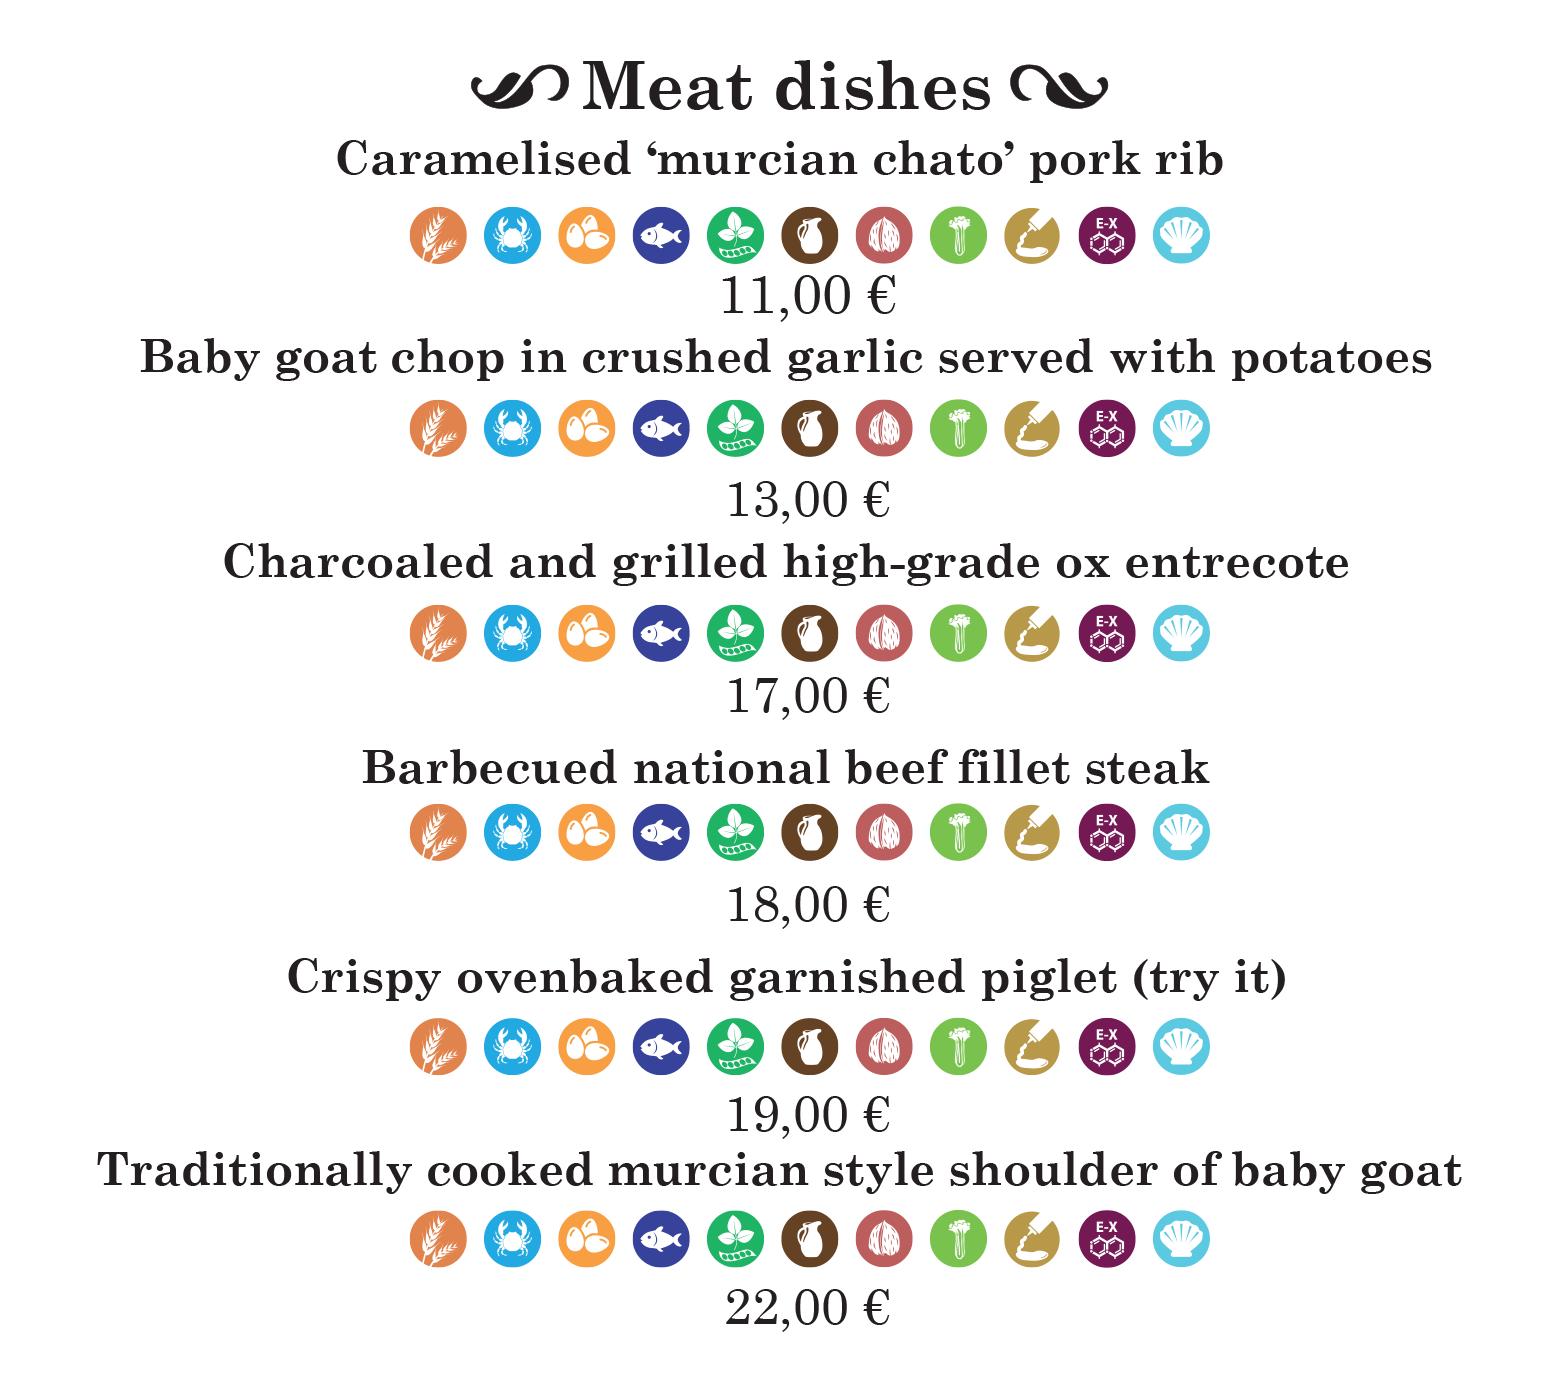 Carta-meat-dishes-english-de-comedor-meson-de-pepe-murcia